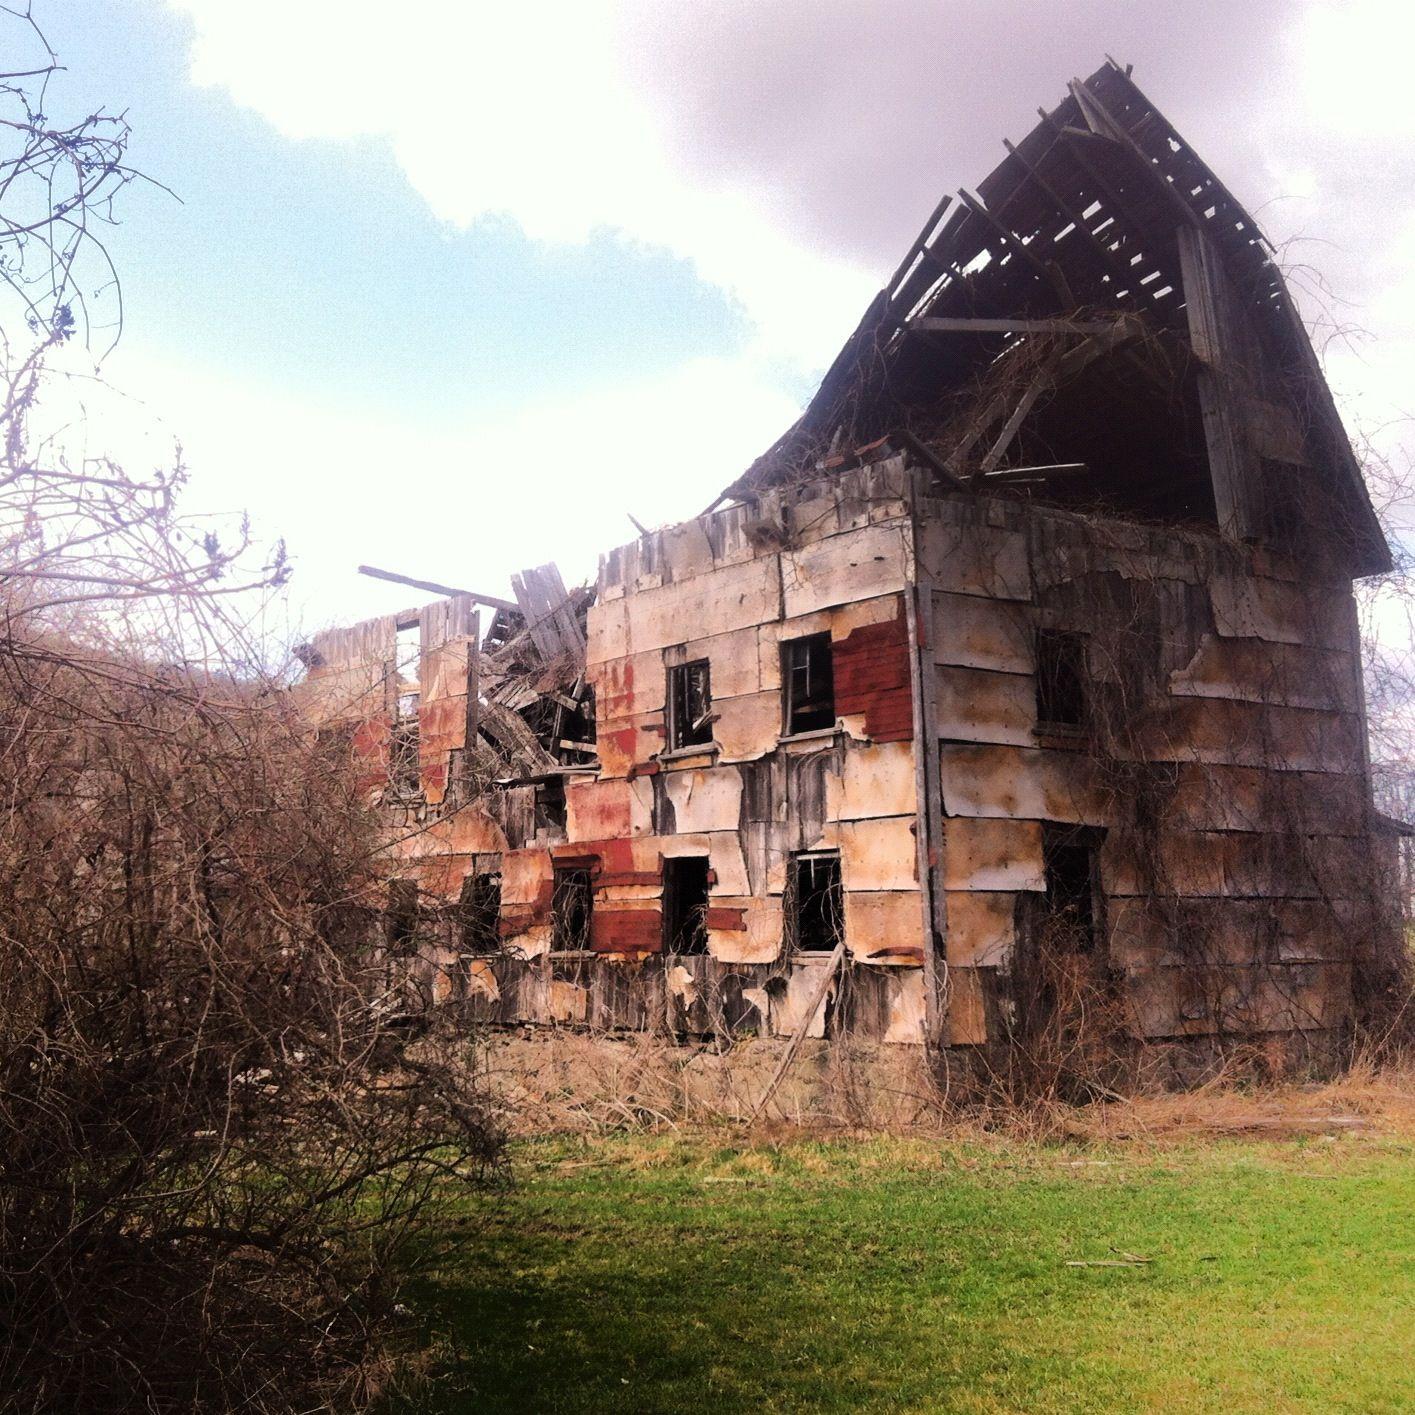 Abandoned: Red Barn, Upstate NY 2012